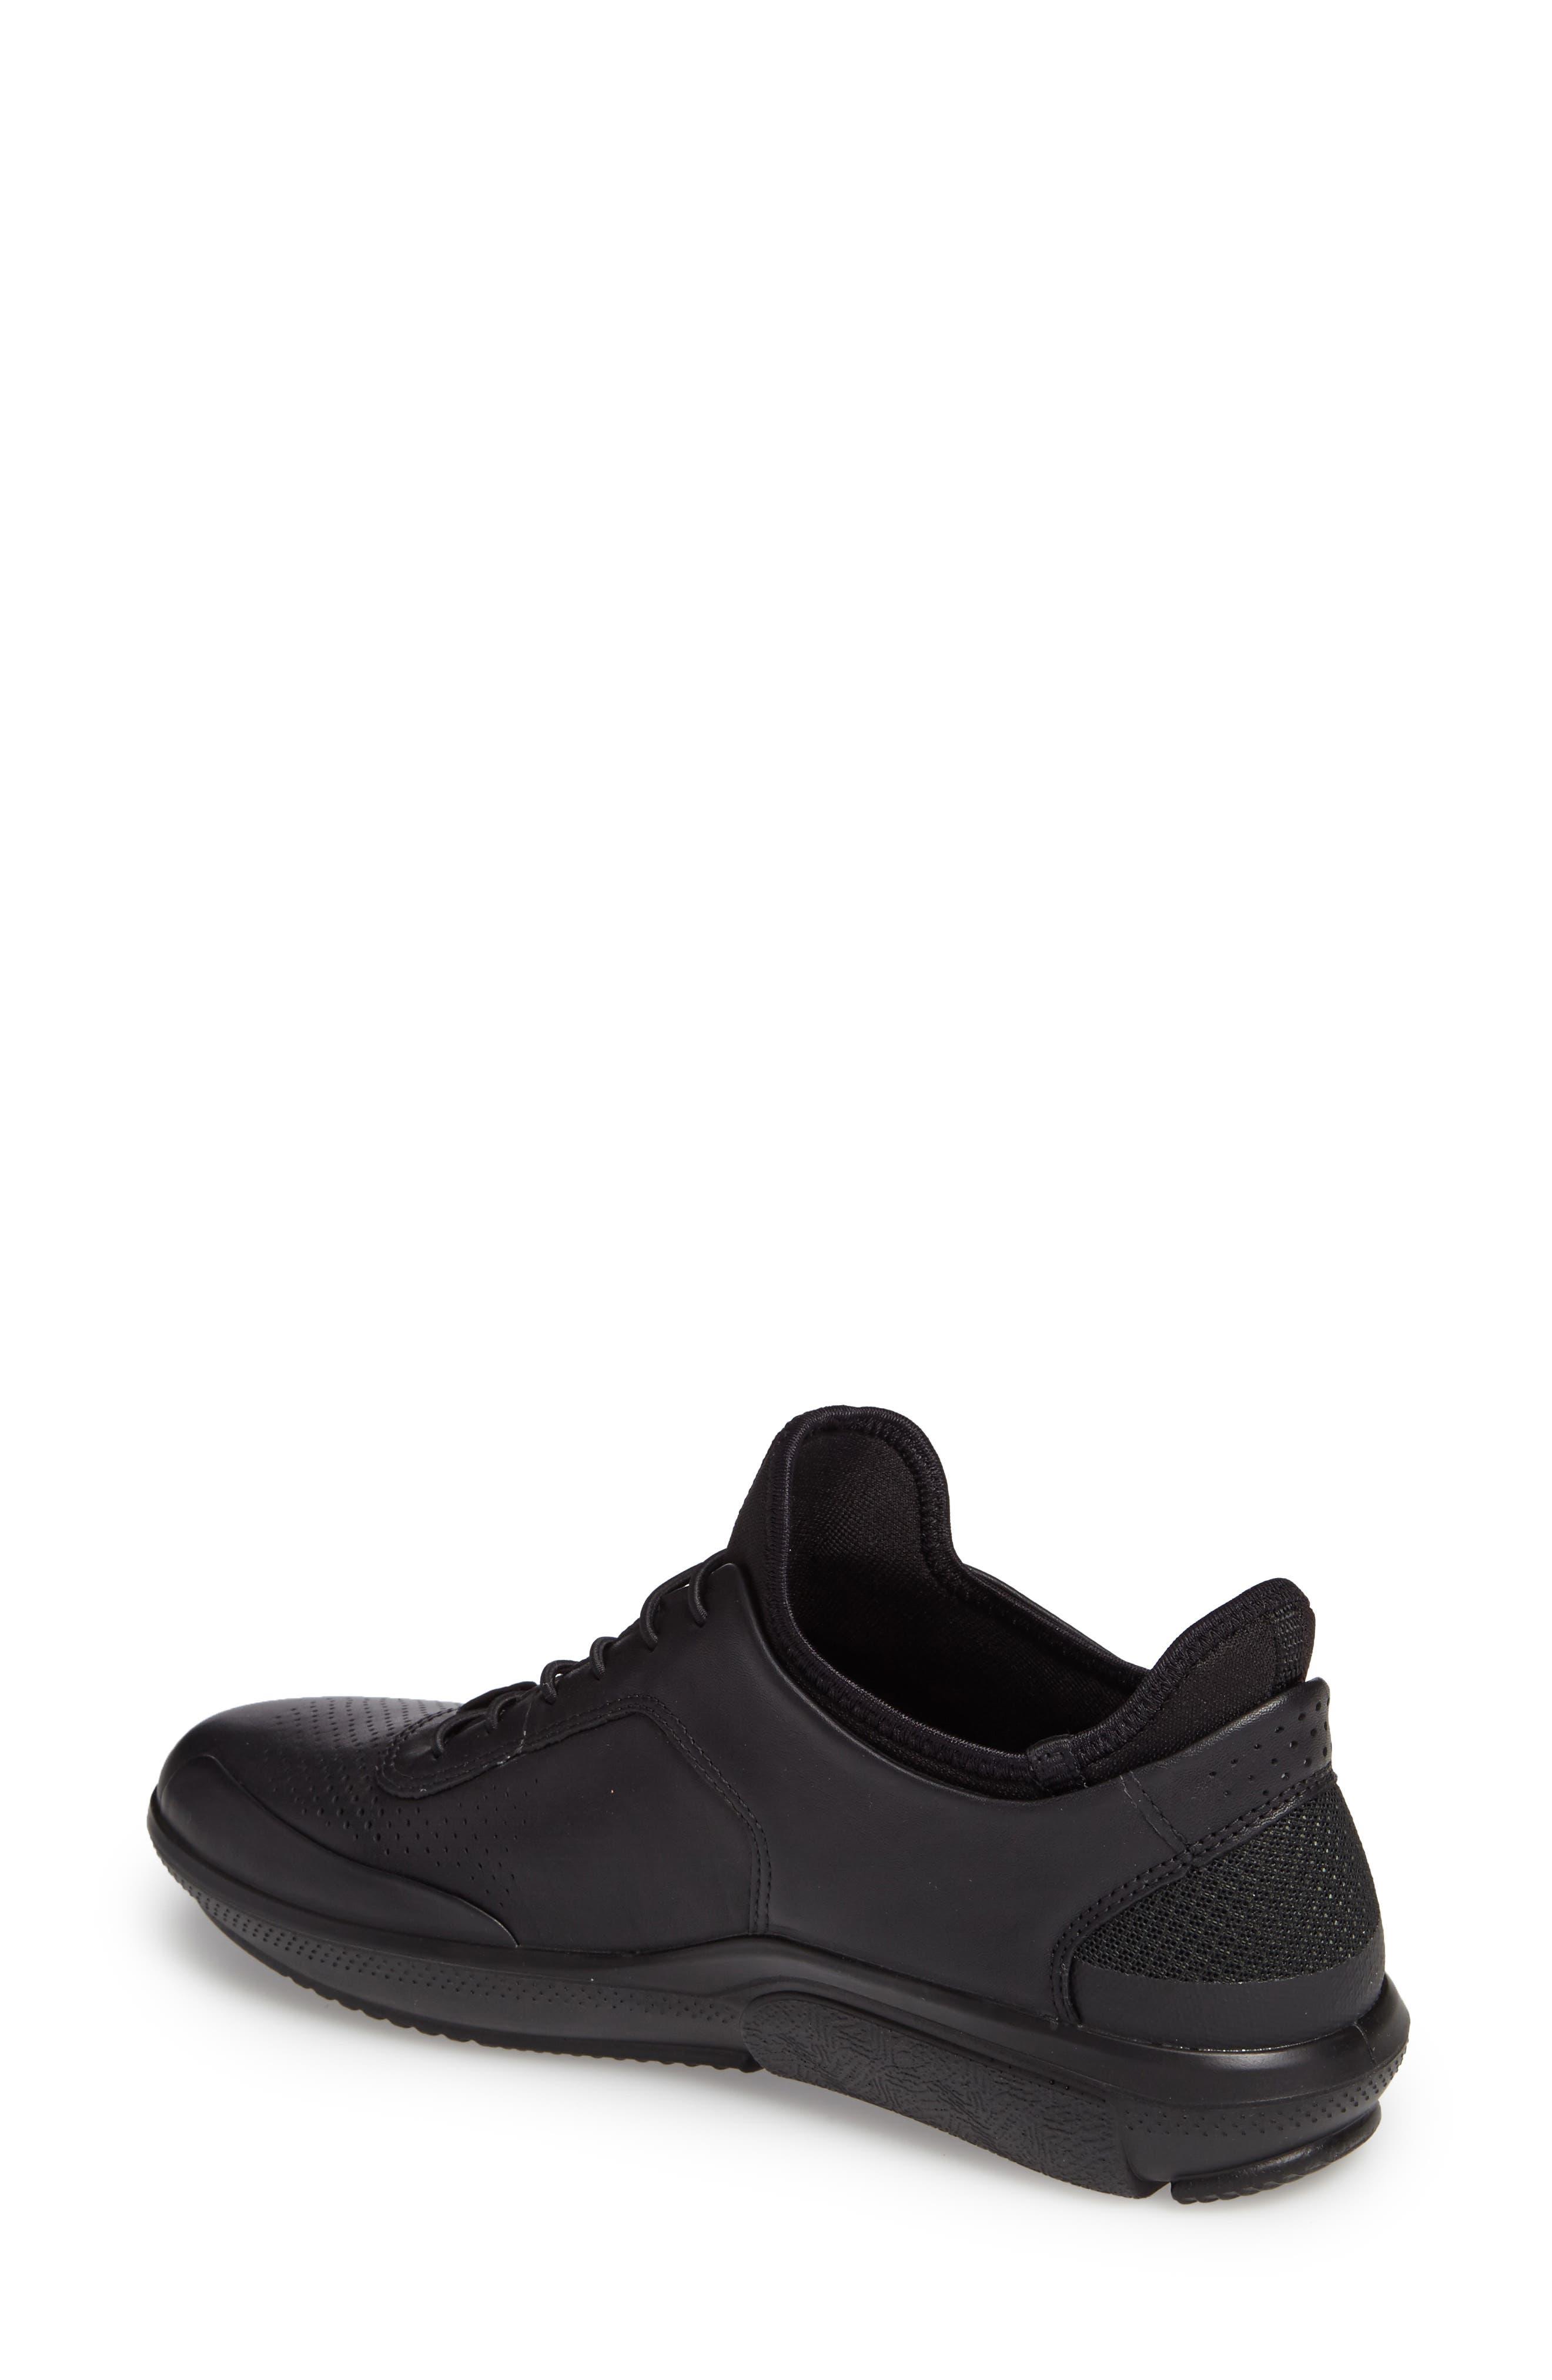 Intrinsic 3 Sneaker,                             Alternate thumbnail 2, color,                             002